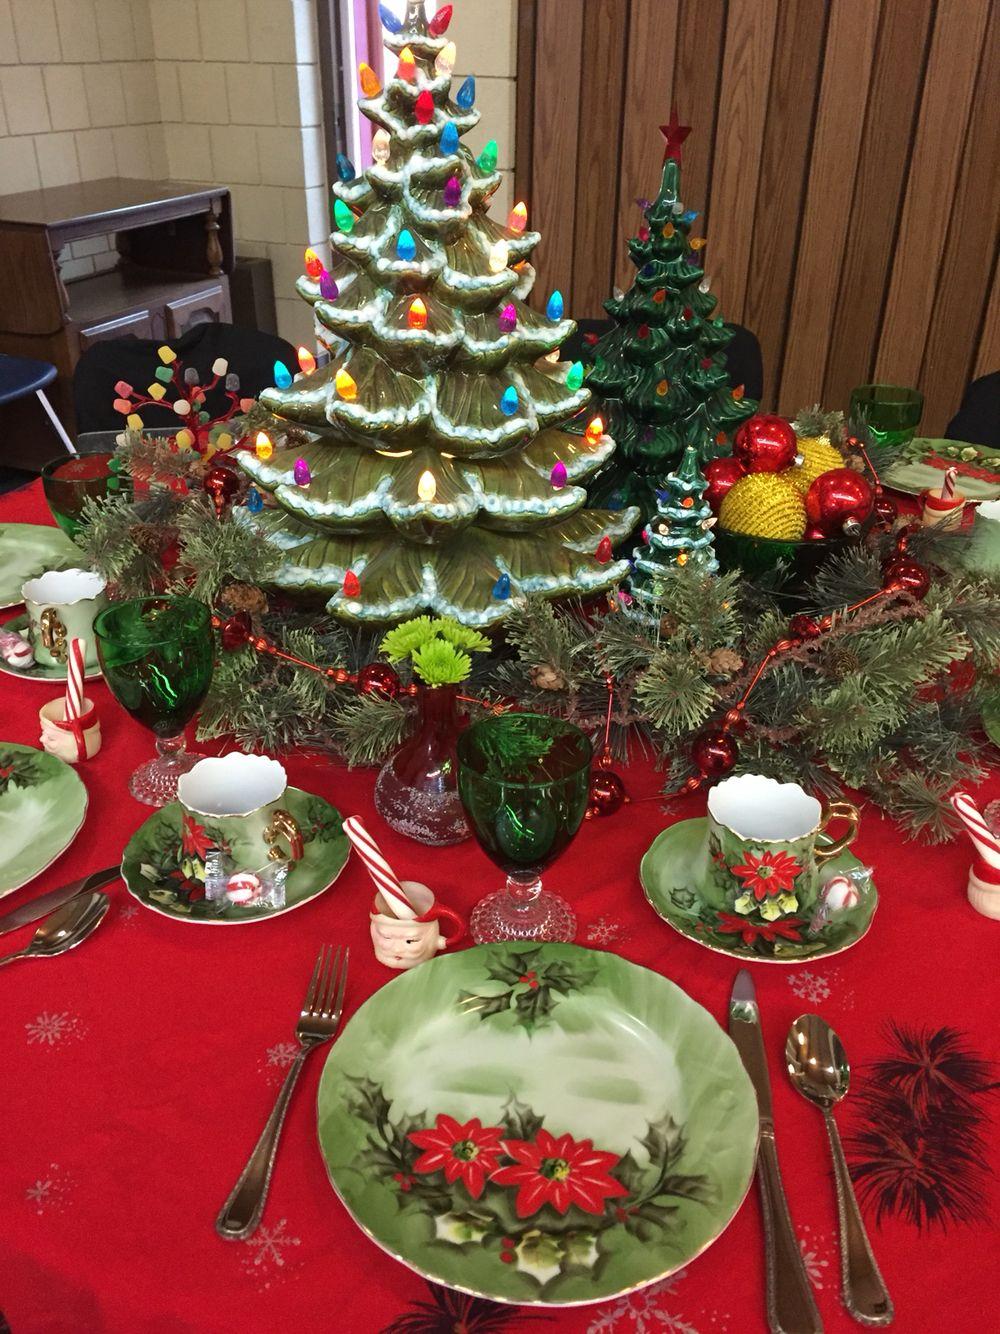 Vintage Christmas Table Setting For Church Daycare Fundraiser Christmas Table Settings Vintage Christmas Decorations Christmas Table